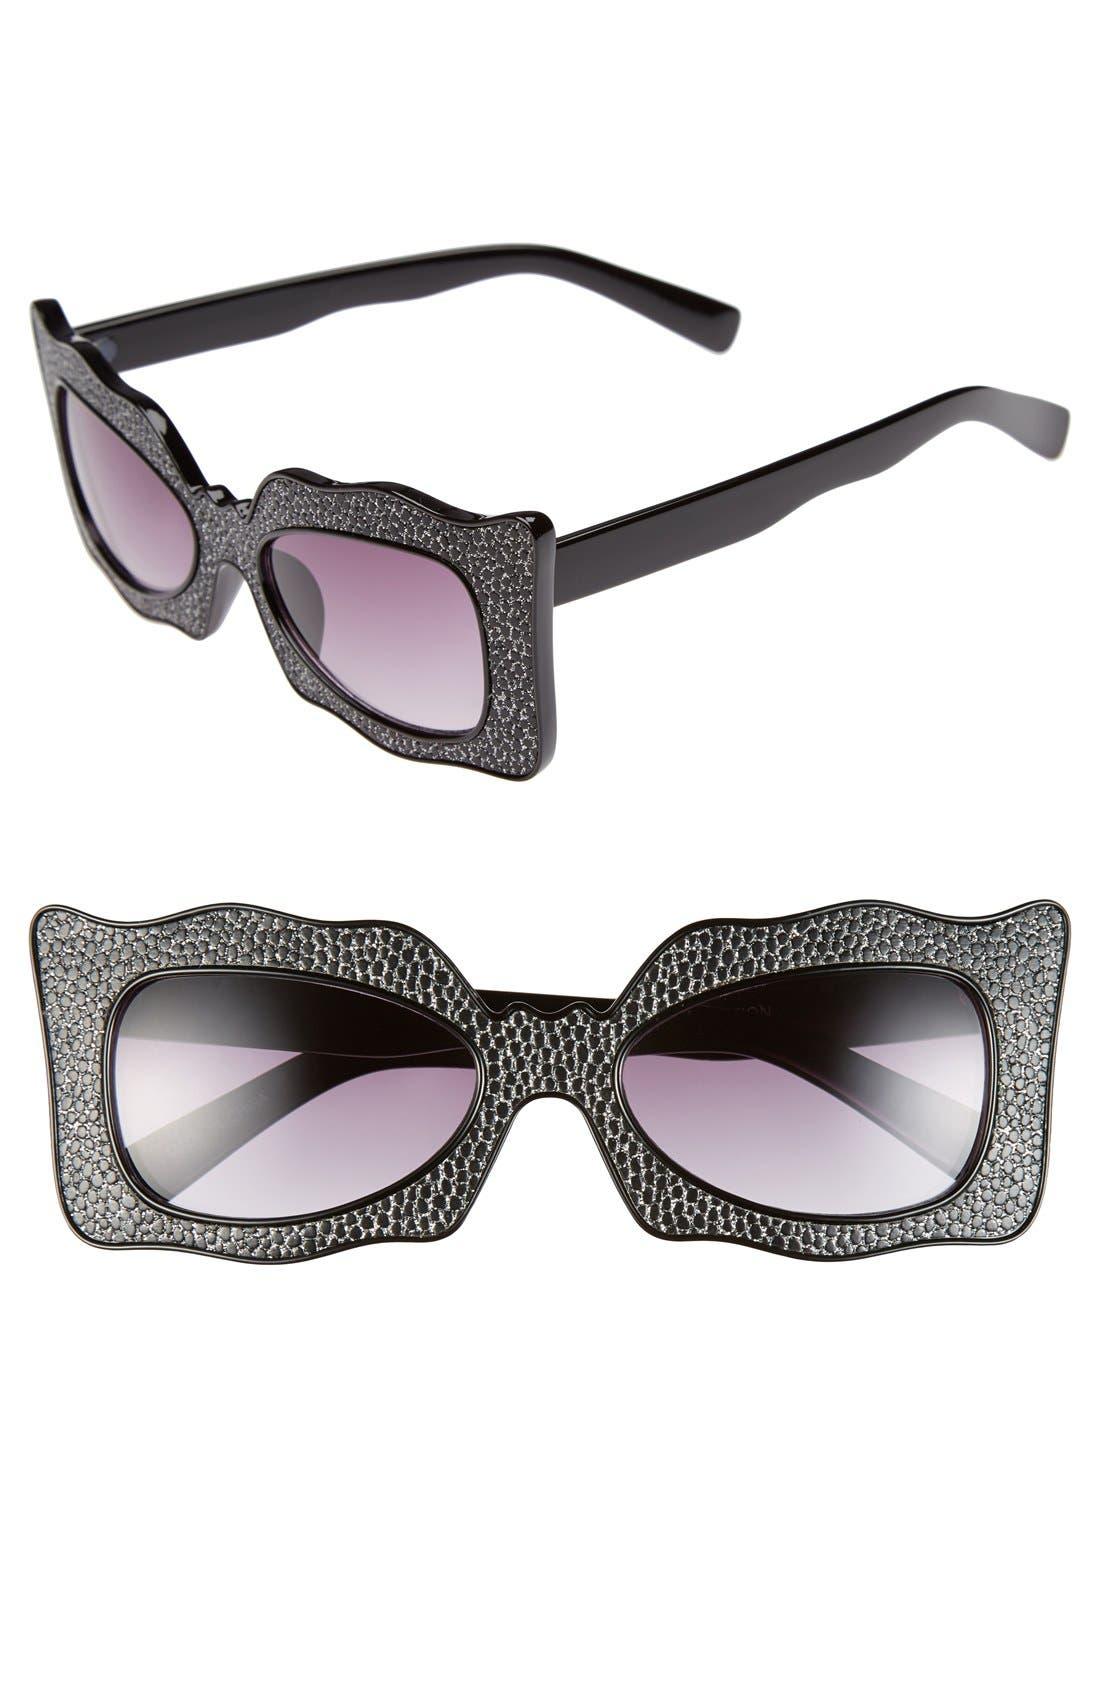 Alternate Image 1 Selected - FE NY 55mm Curvy Rectangle Glitter Sunglasses